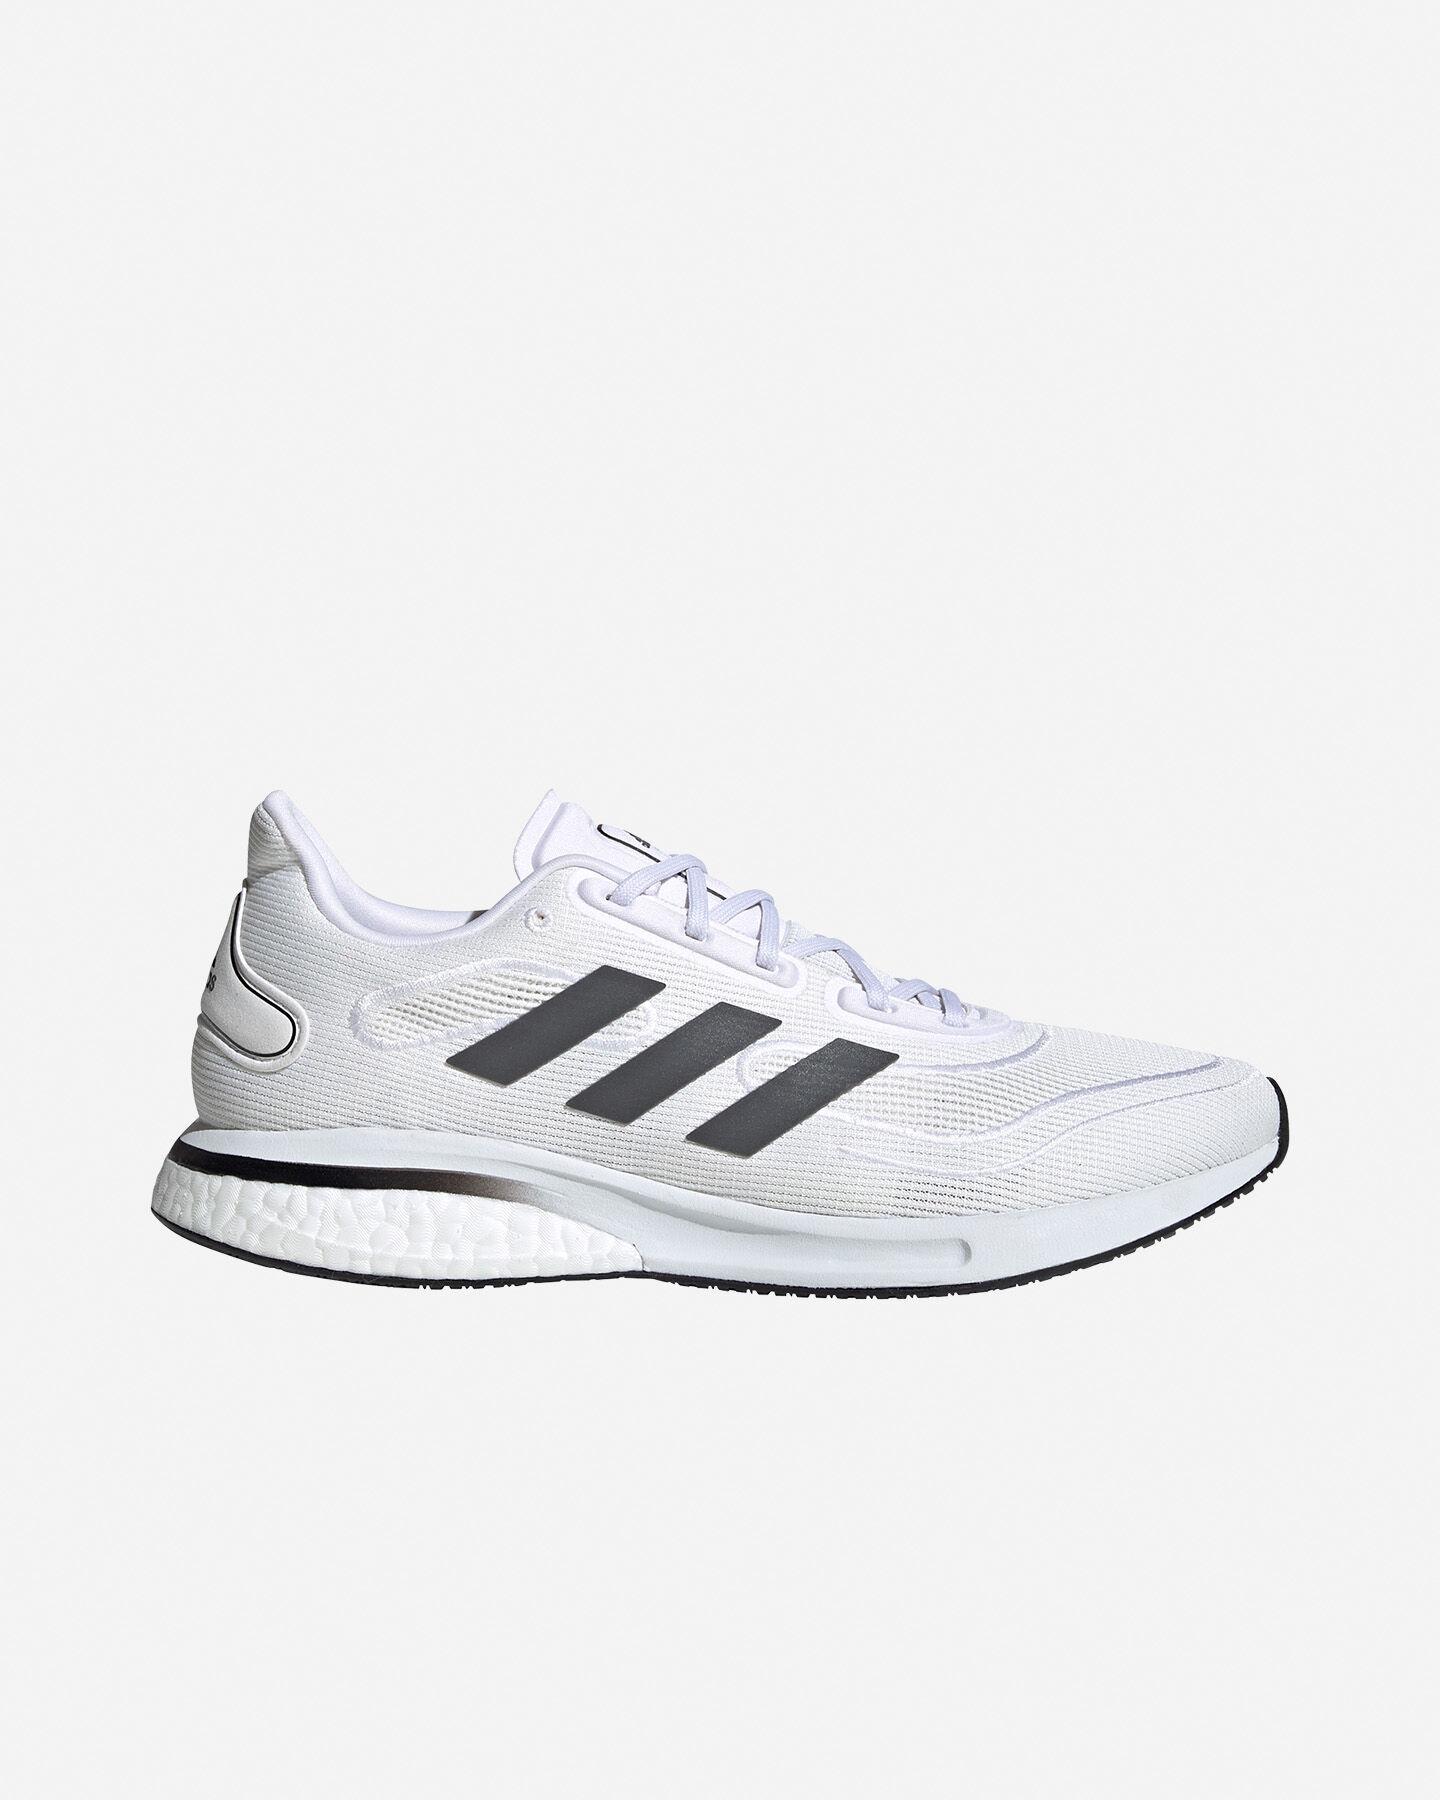 adidas supernova m scarpe running uomo